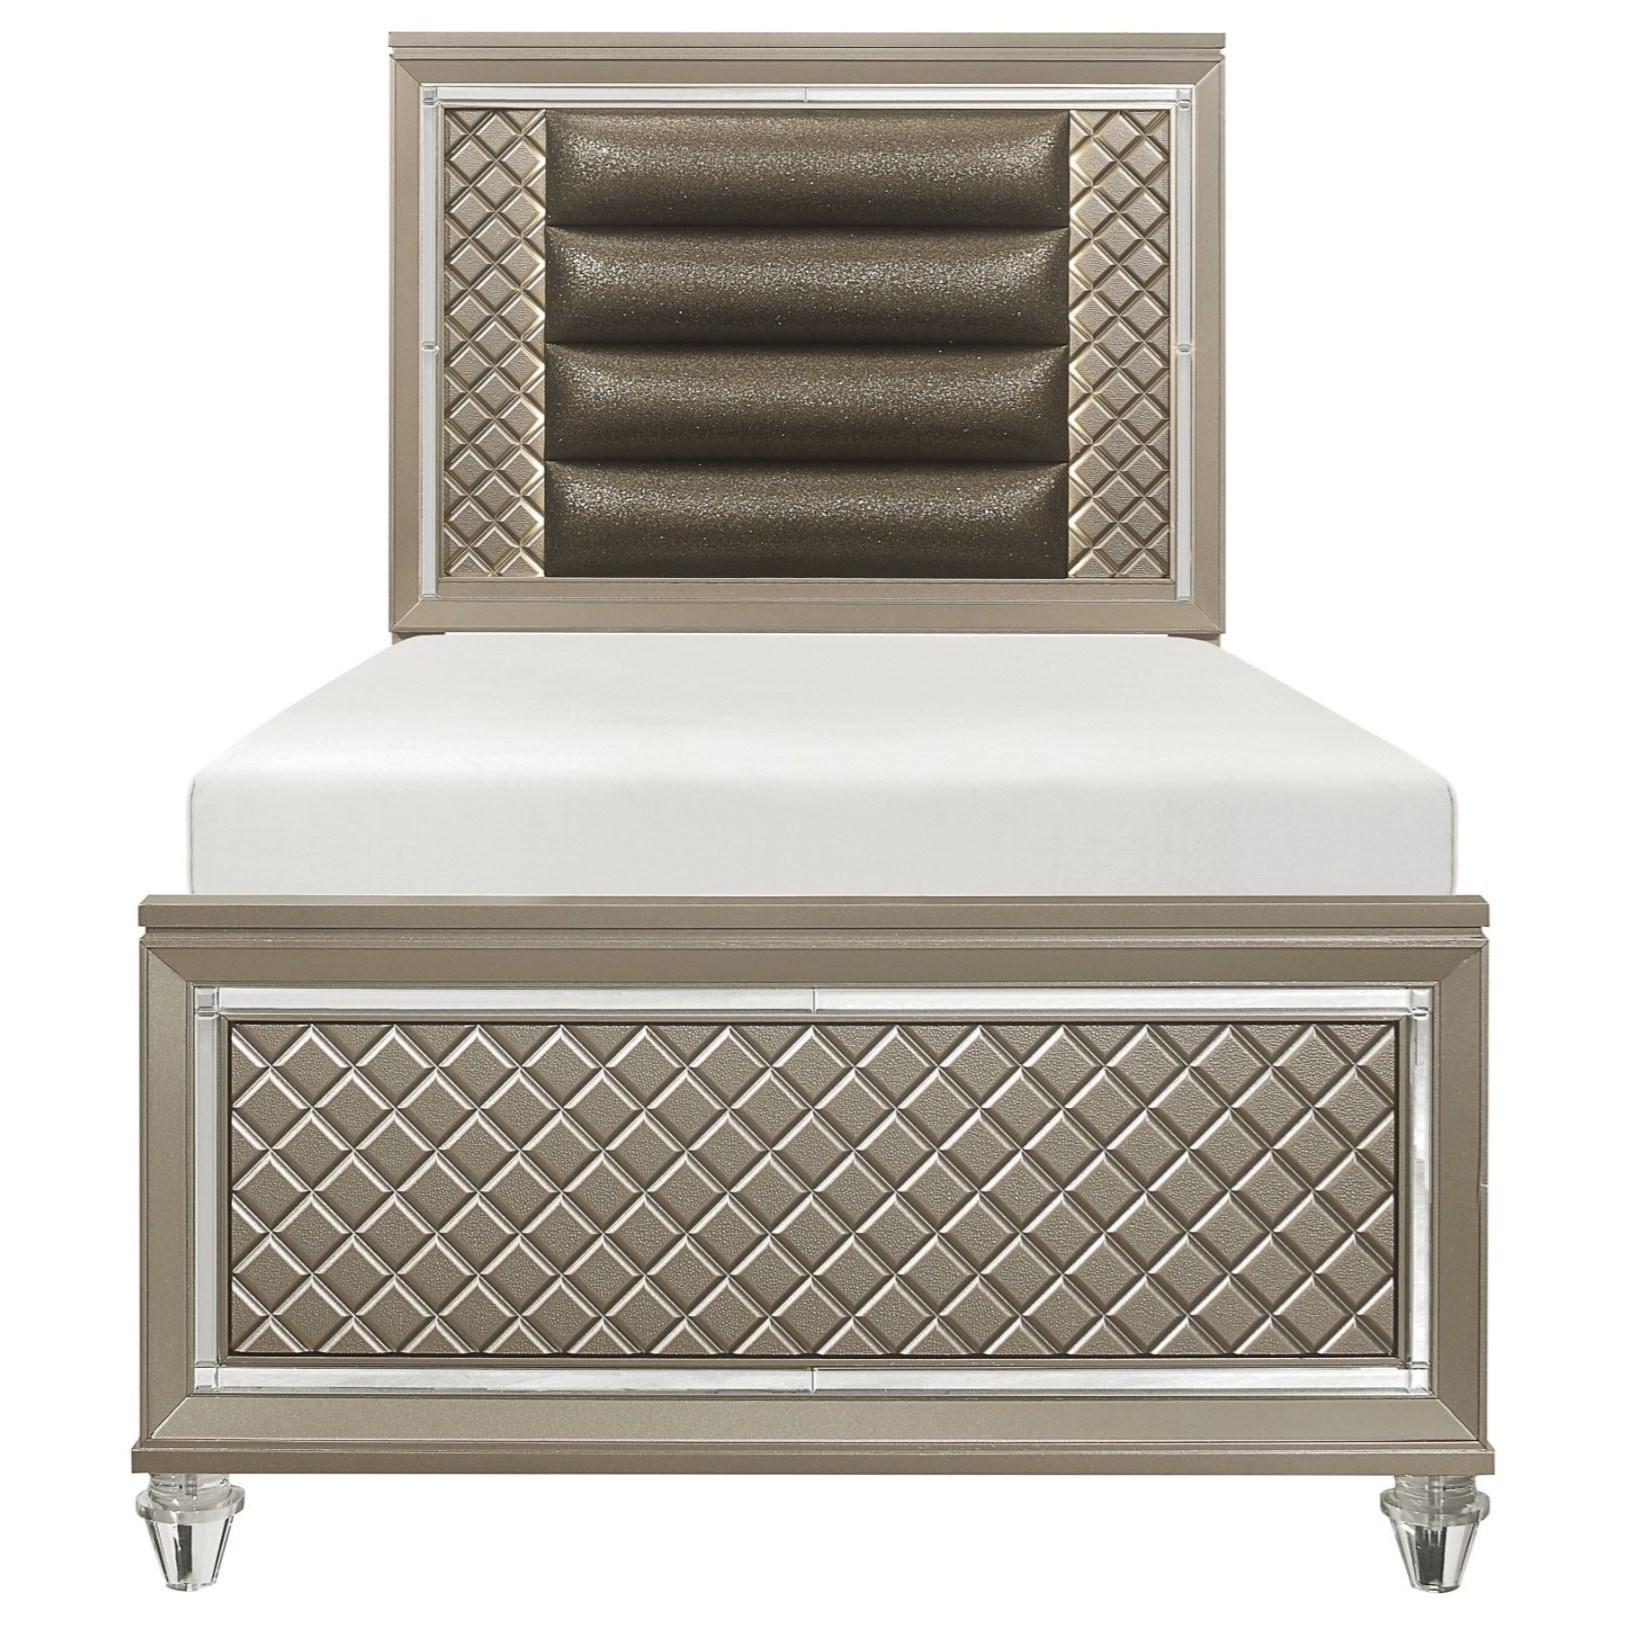 Loudon Twin Platform Bed by Homelegance at Darvin Furniture